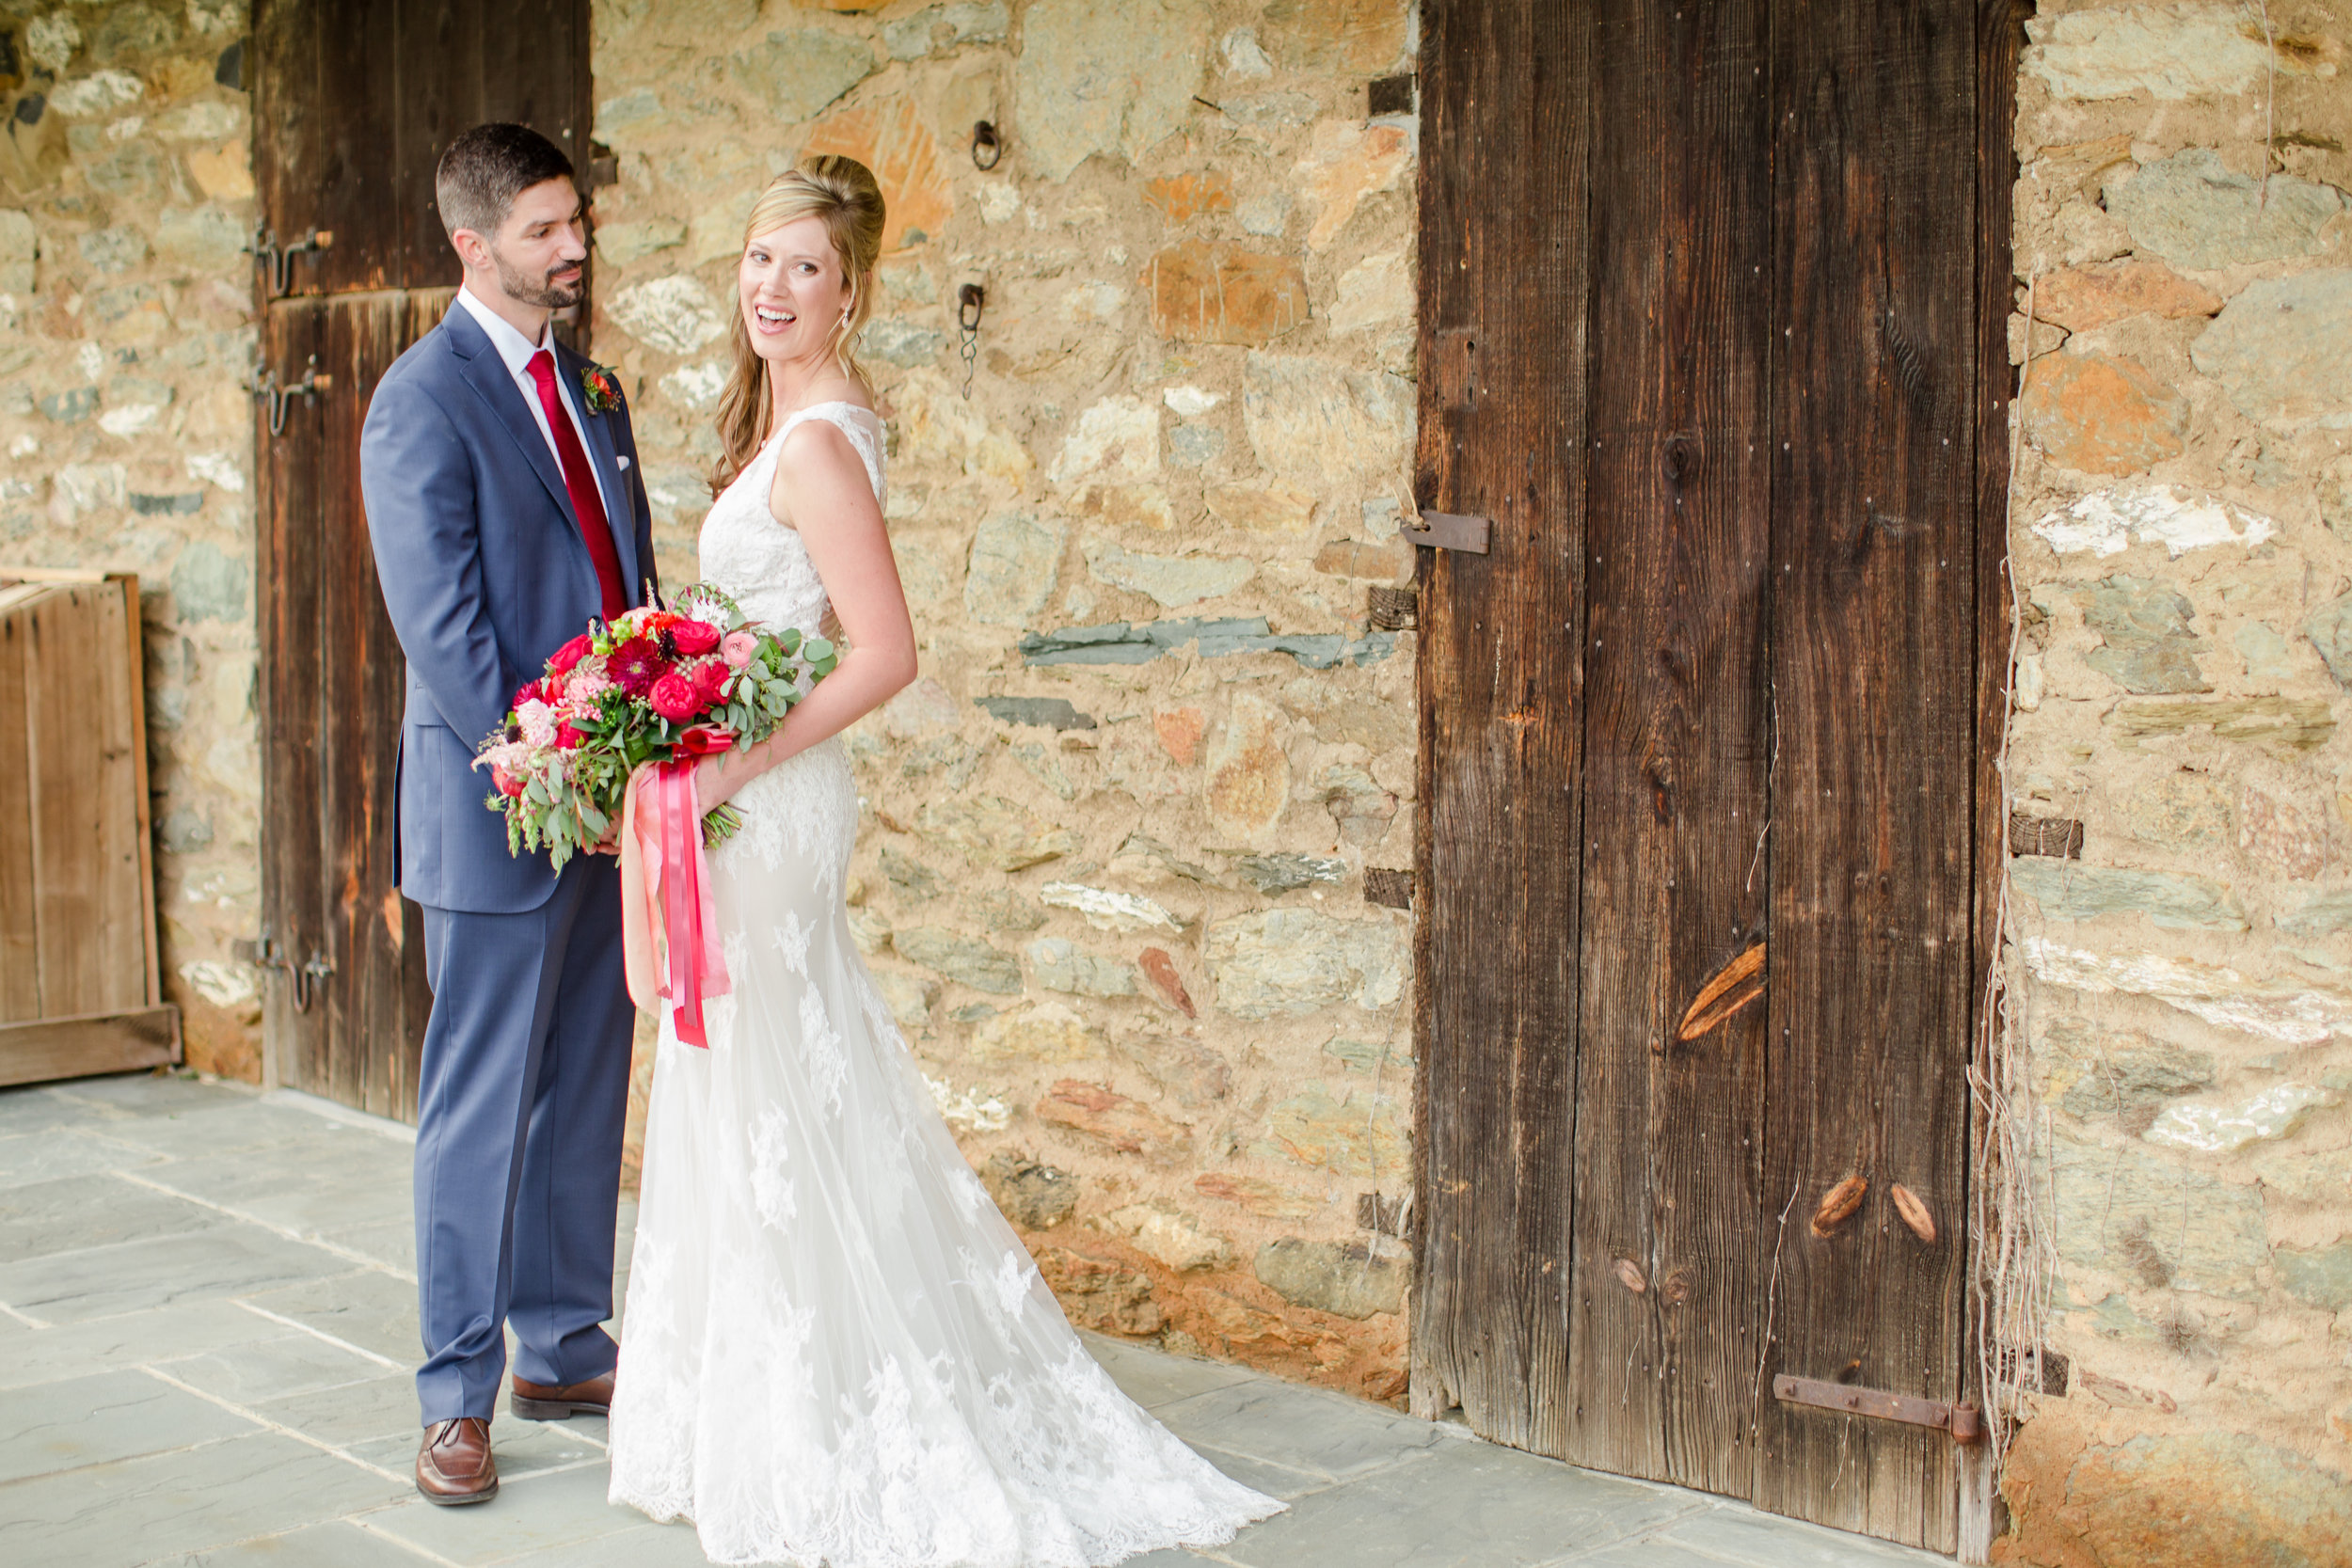 chelsea-and-eric-wedding-brideandgroom-5627.jpg